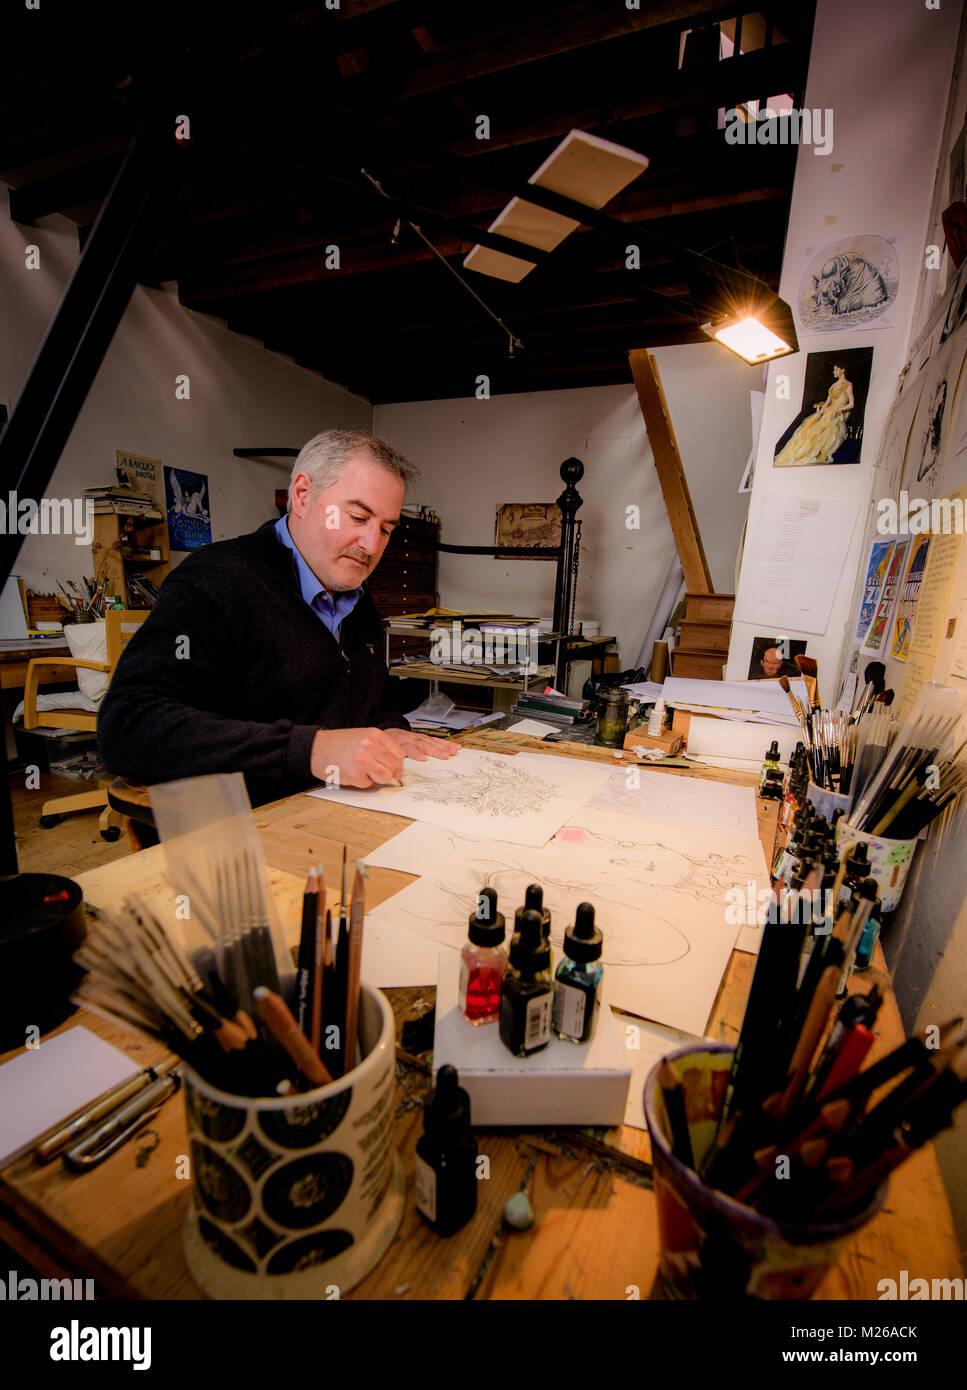 Illustrator and political cartoonist Chris Riddell at his Brighton studio in East Sussex UK. - Stock Image